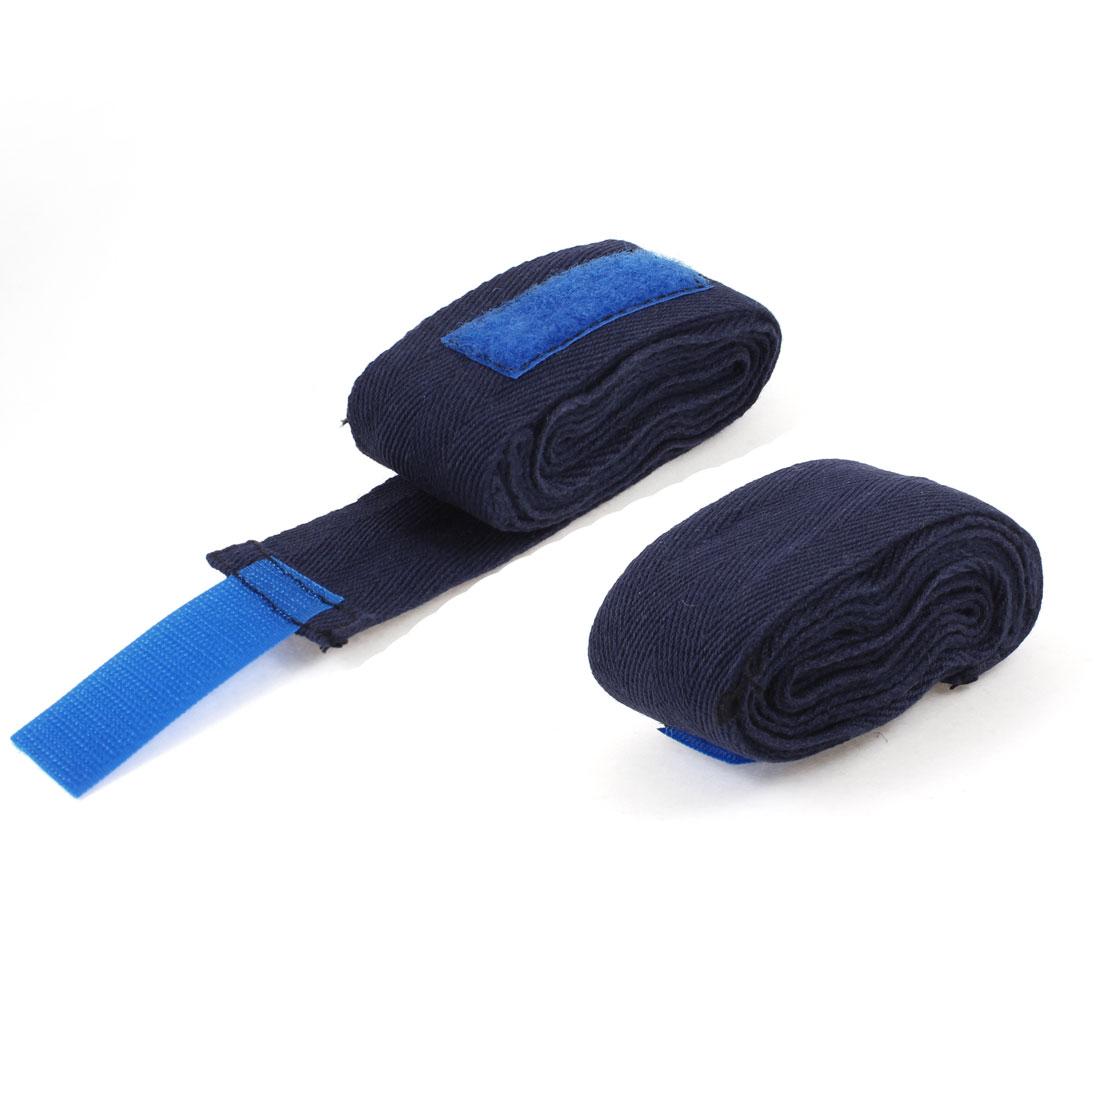 Boxer Boxing 7.3Ft Long Textured Hand Wraps Strap Bandage Navy Blue 2 Pcs